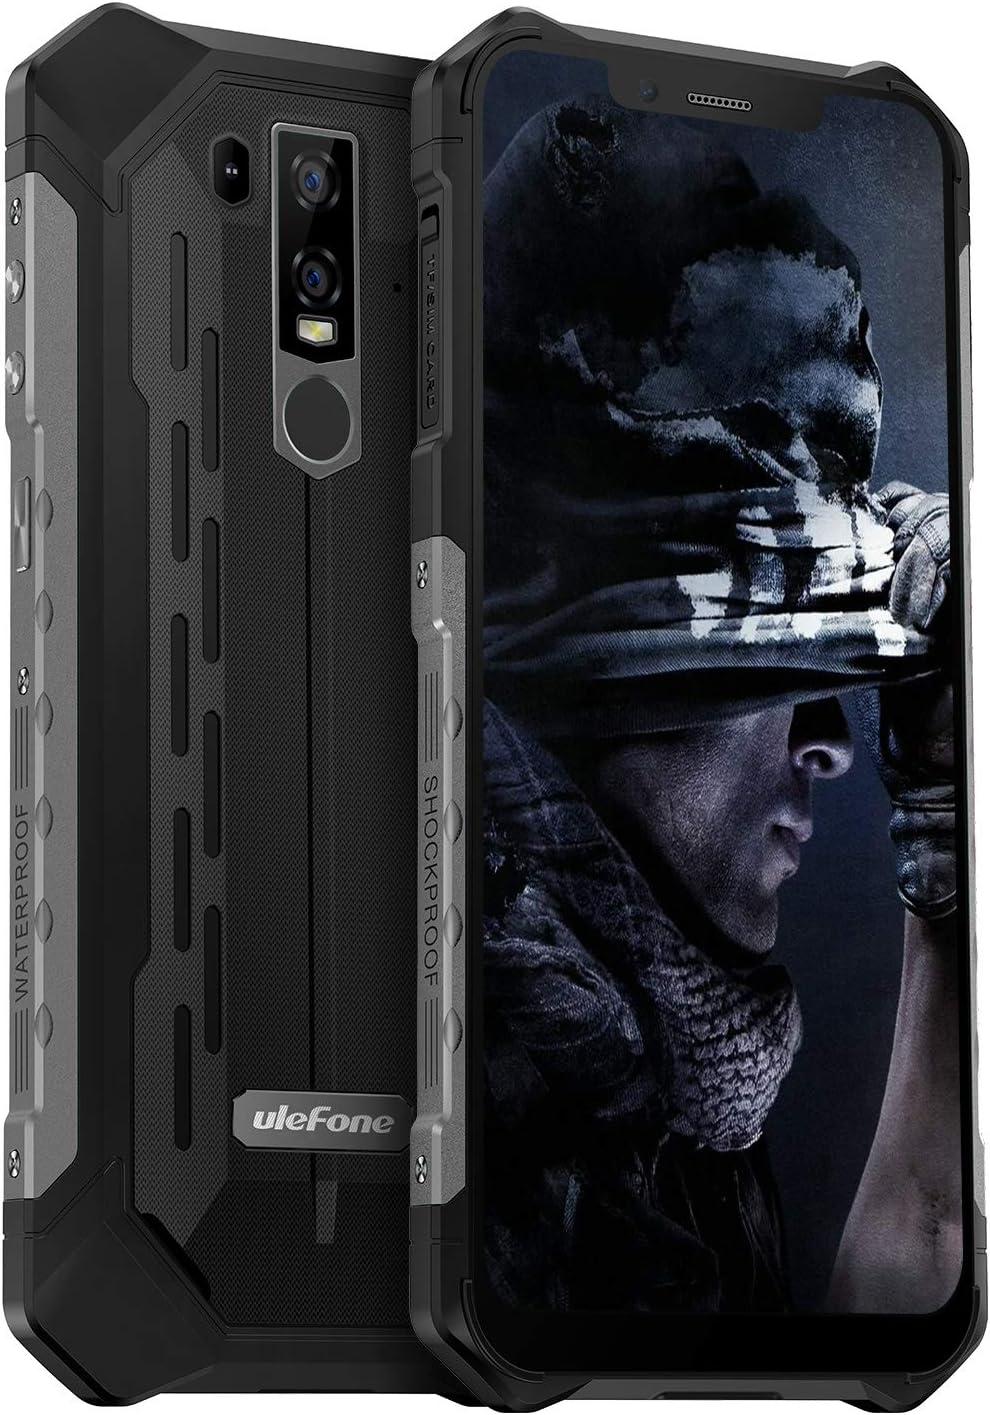 Rugged Cell Phone Unlocked Ulefone Armor 6e Ip68 Waterproof Outdoor Smartphone Android 9 Helio P70 Octa Core 4gb 64gb 6 2 Inch 5000mah Dual Camera Global Dual 4g Fingerprint Face Unlocked Nfc Black Amazon Com